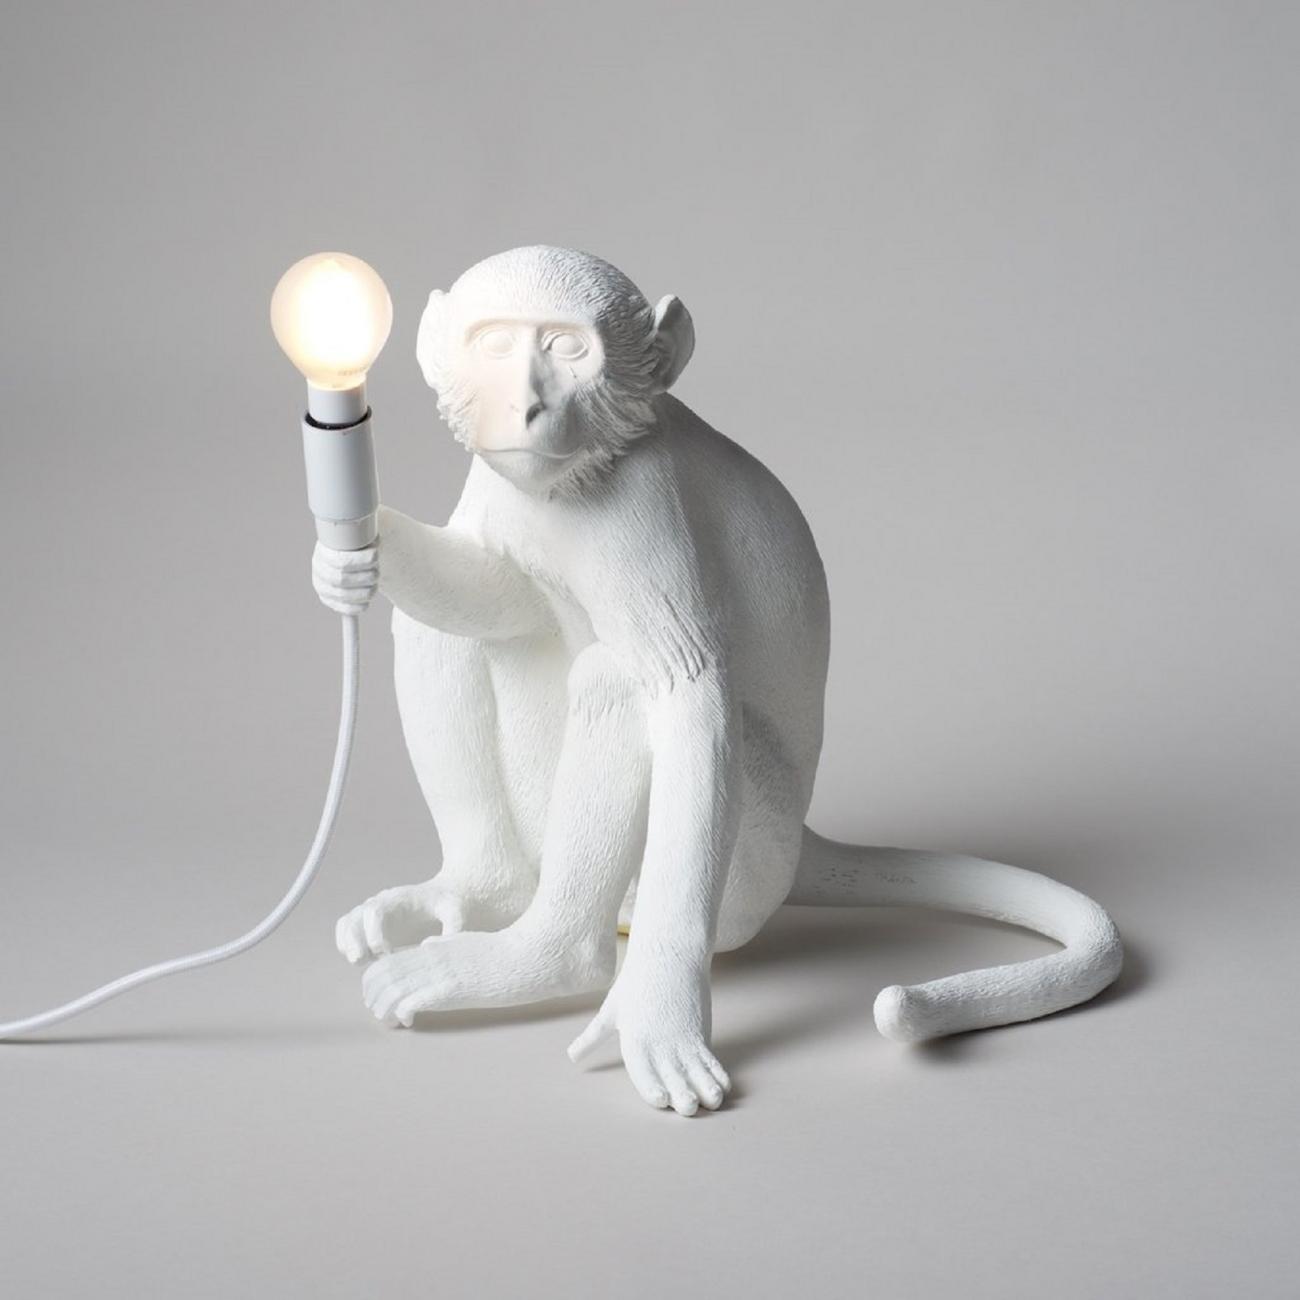 SELETTI THE MONKEY LAMP SITTING VERSION